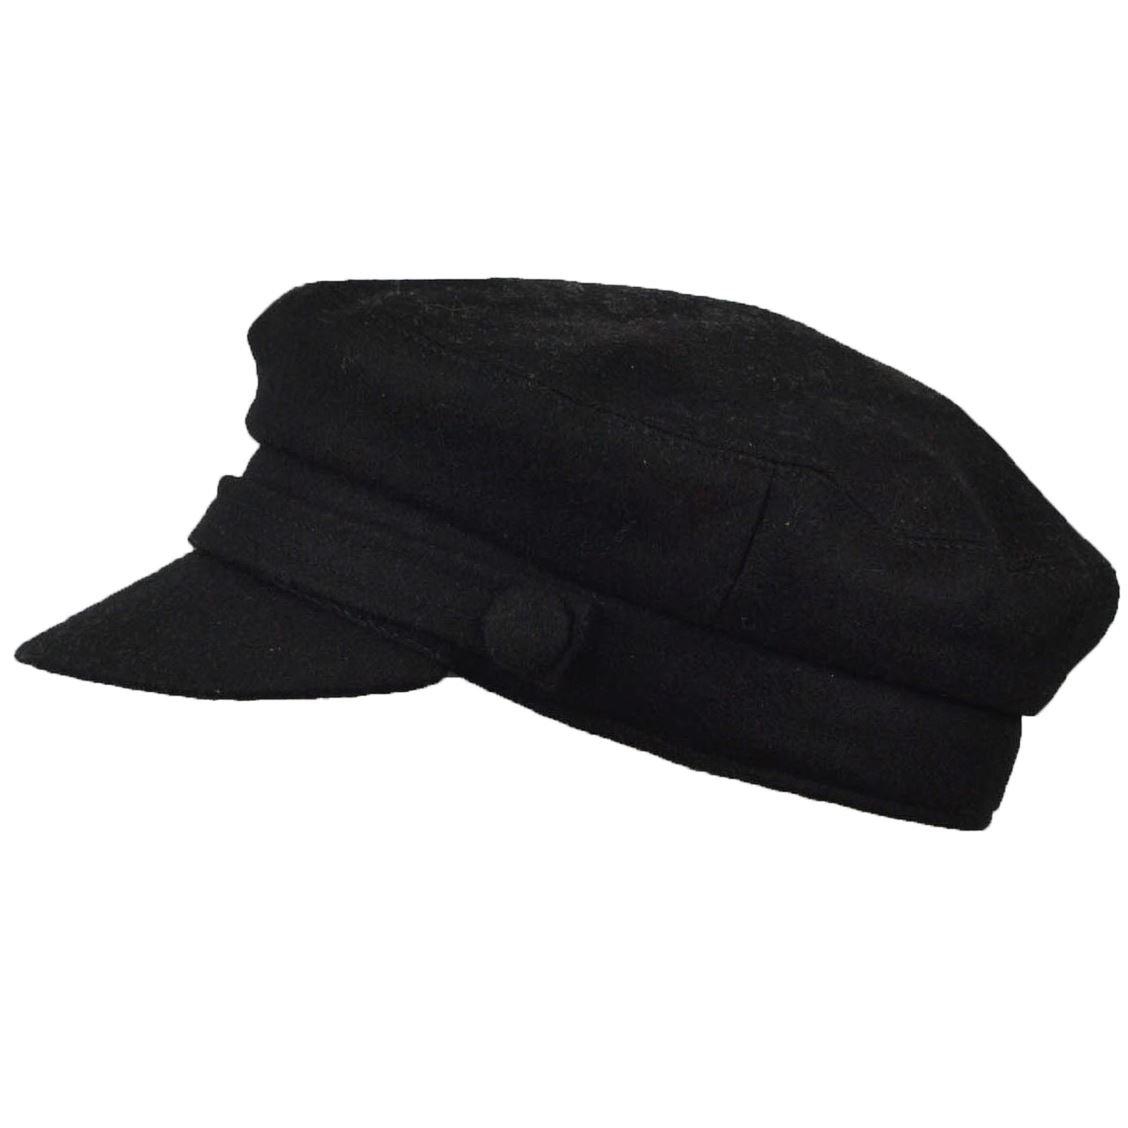 68081c0ca51 Best Rated in Women s Hats   Caps   Helpful Customer Reviews ...